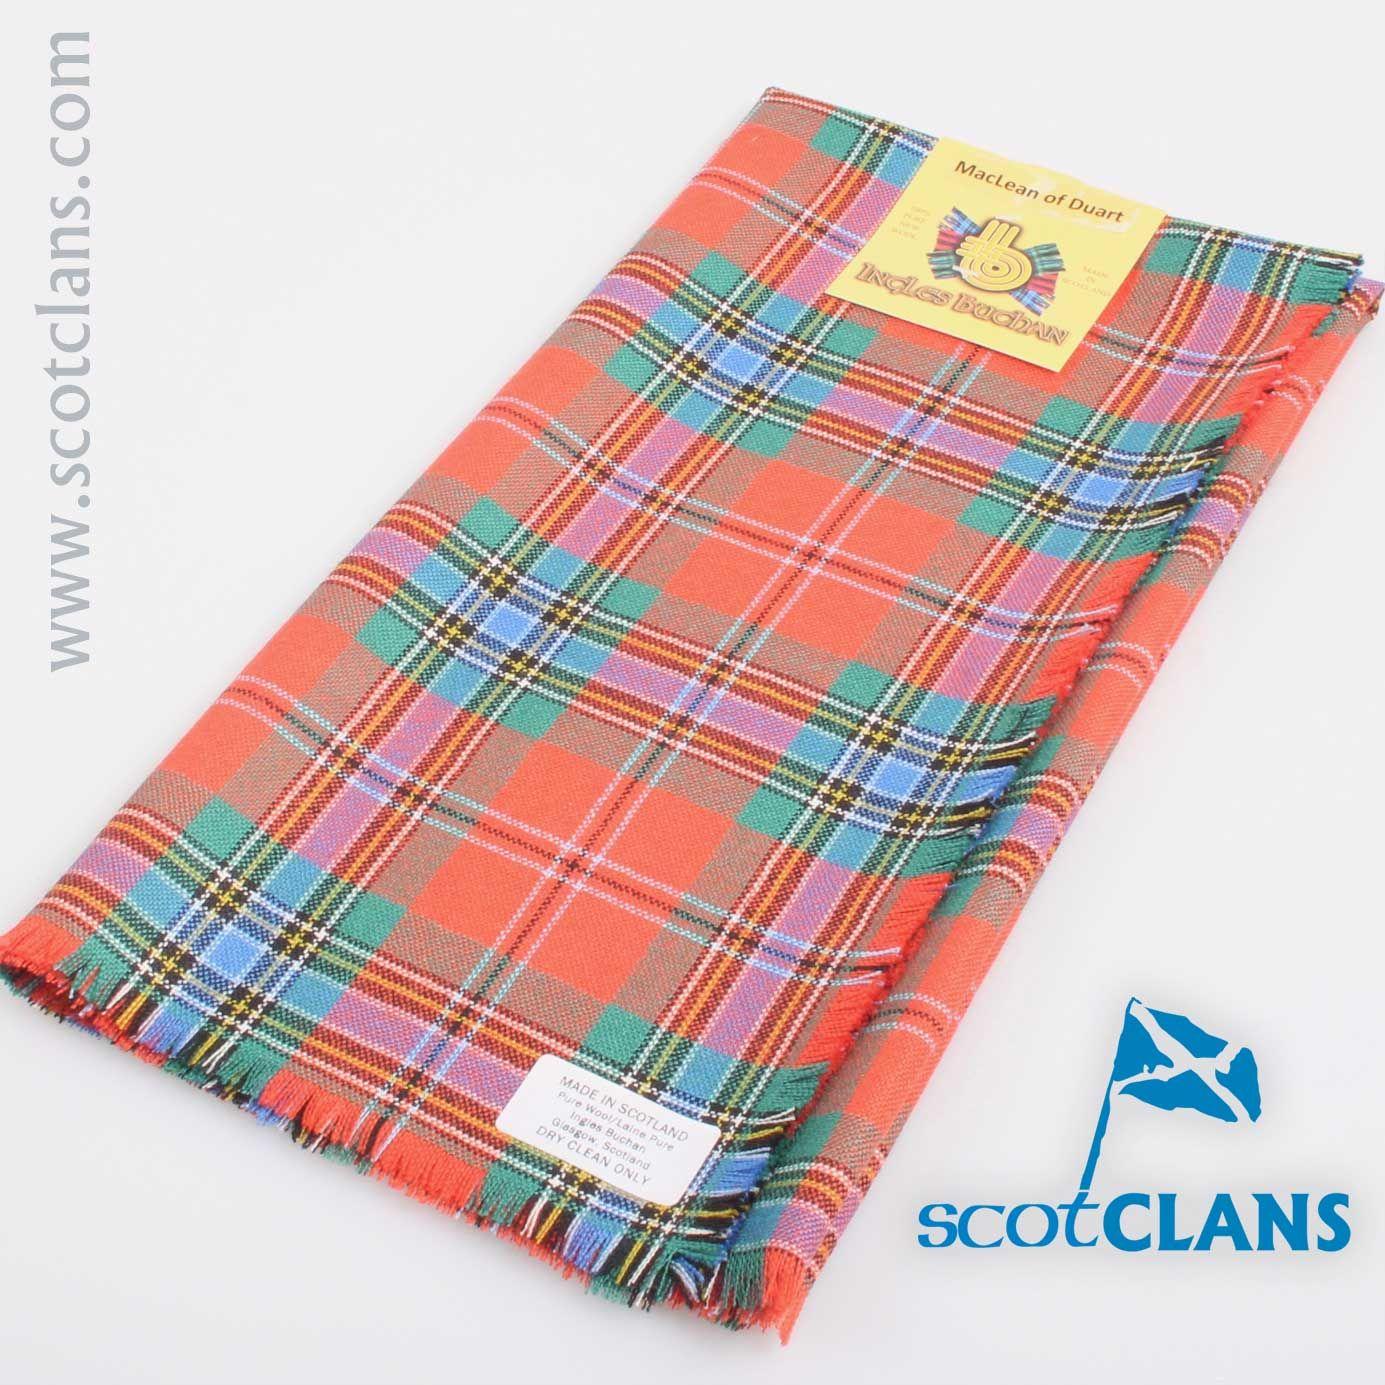 Mens Clan Tie Made in Scotland MacLean of Duart Ancient Tartan